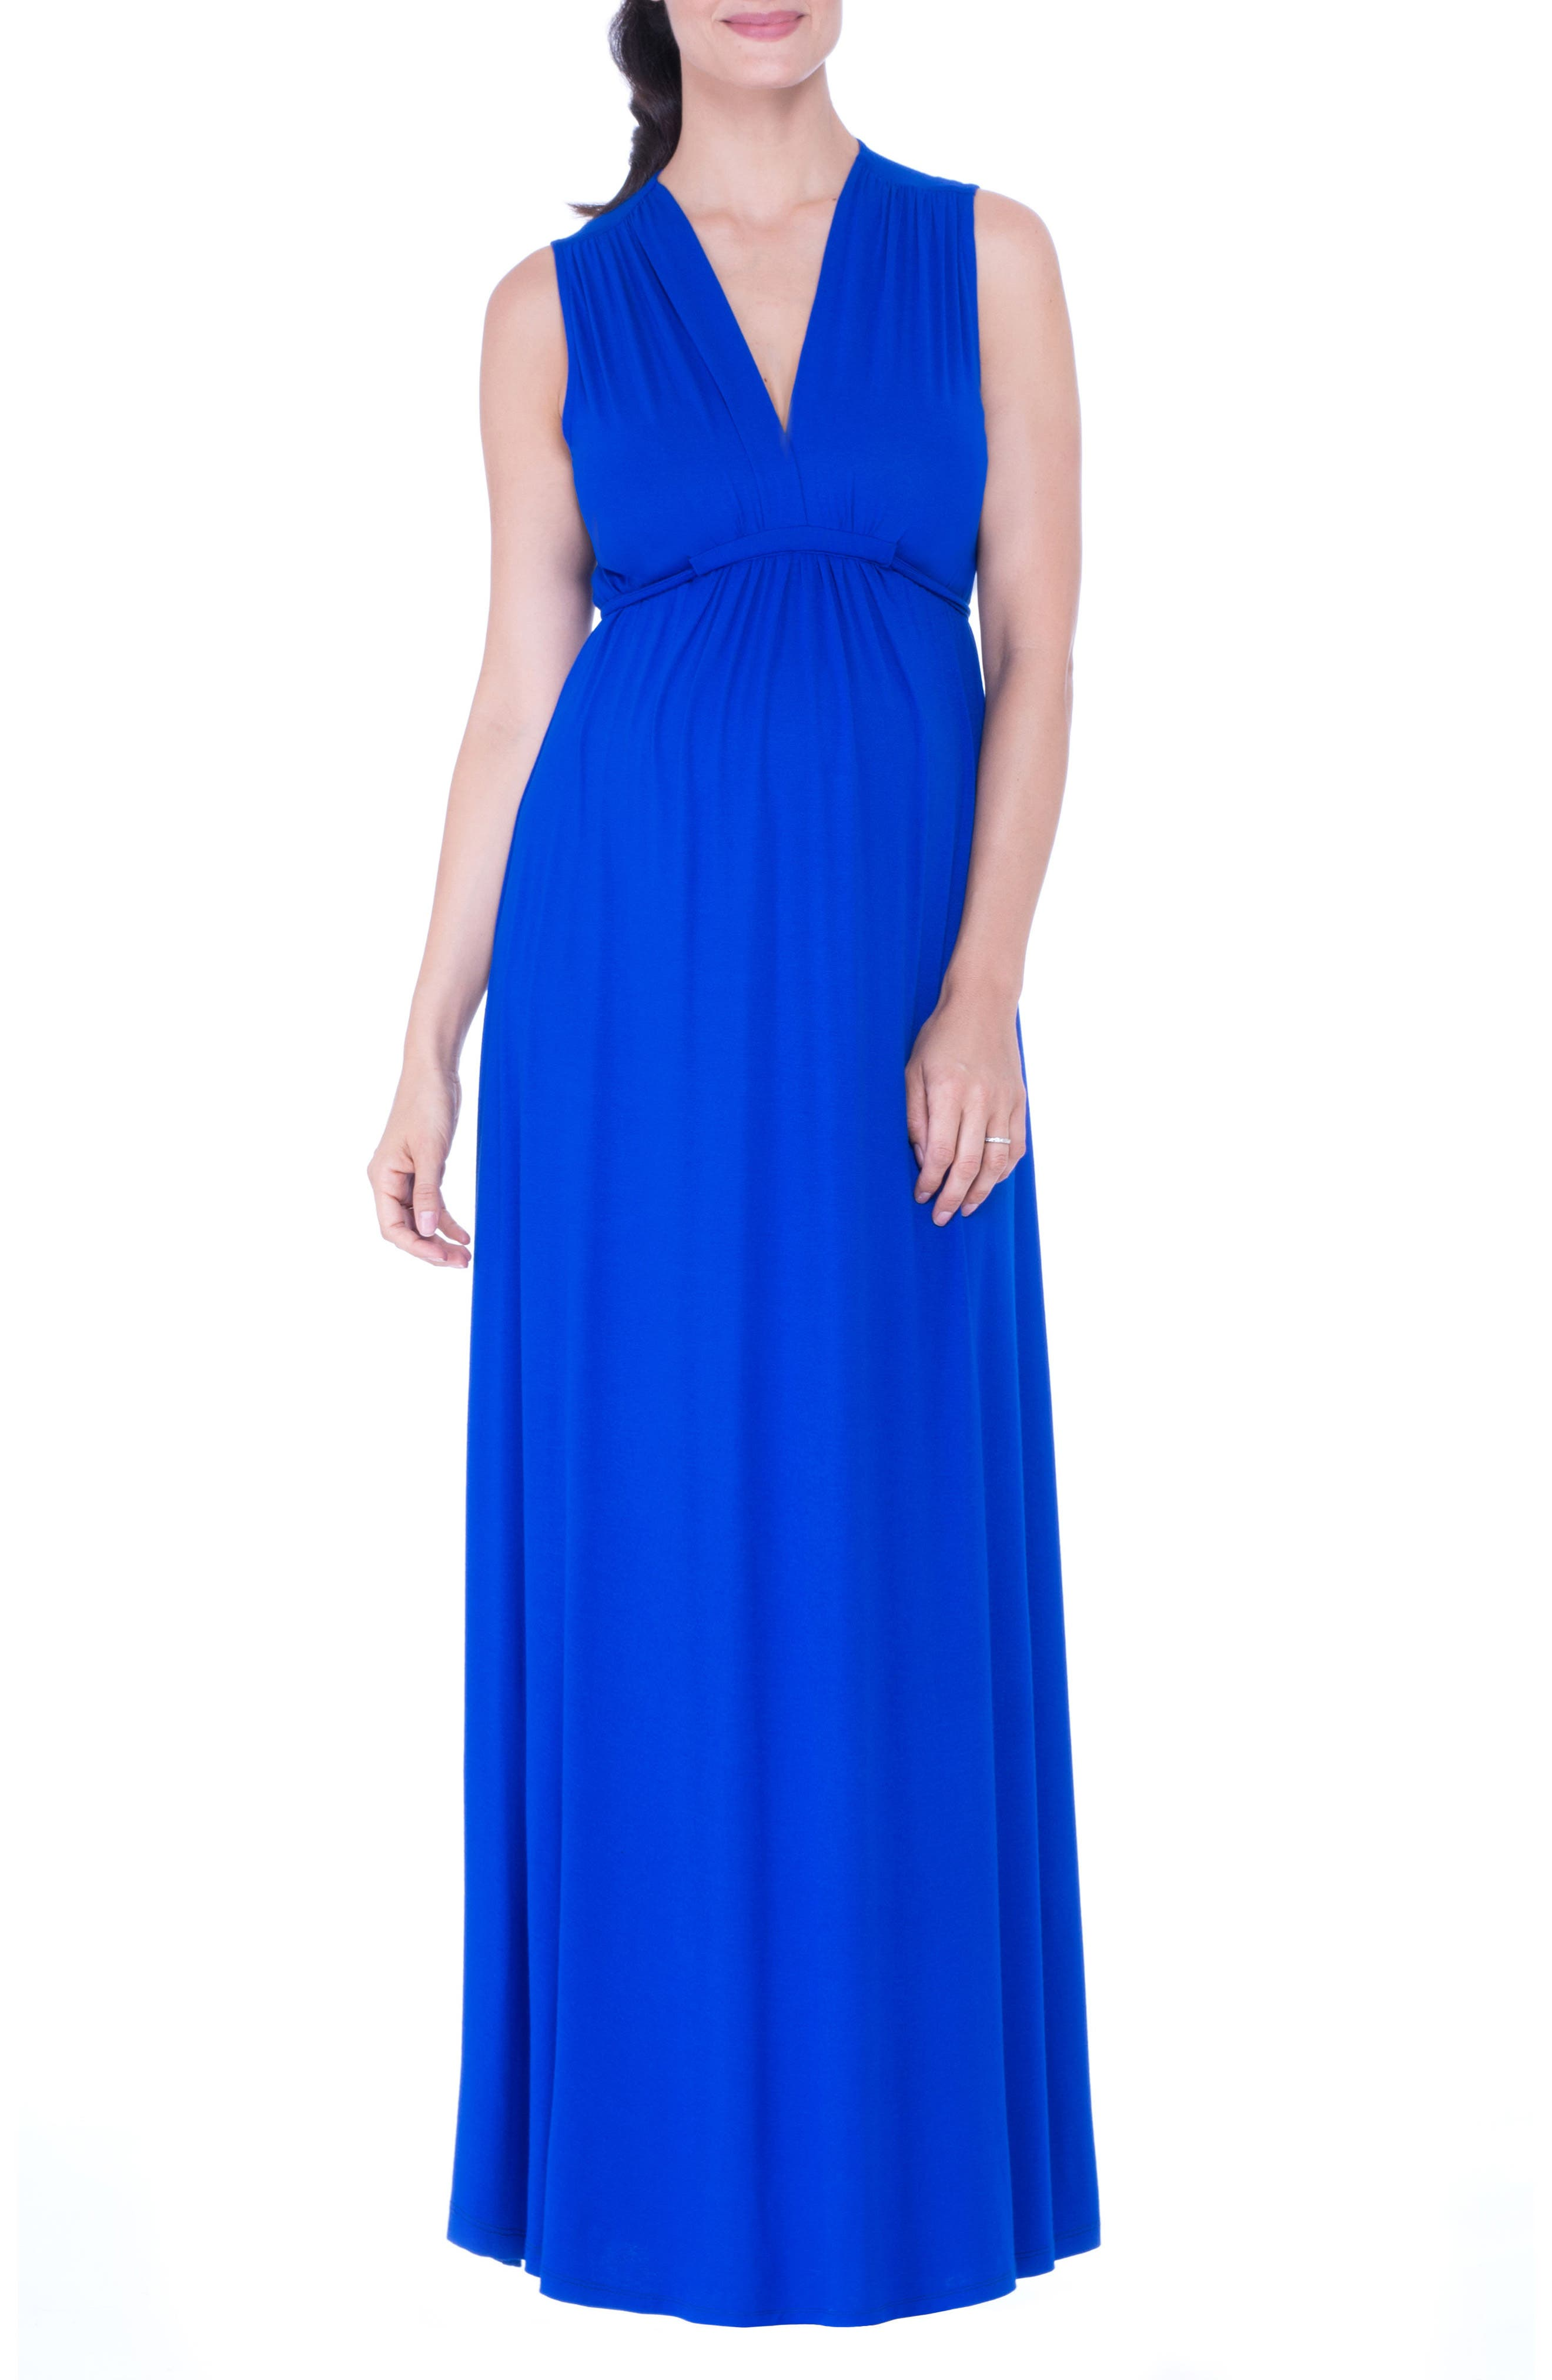 Lucy Maternity Maxi Dress,                             Main thumbnail 1, color,                             BLUE